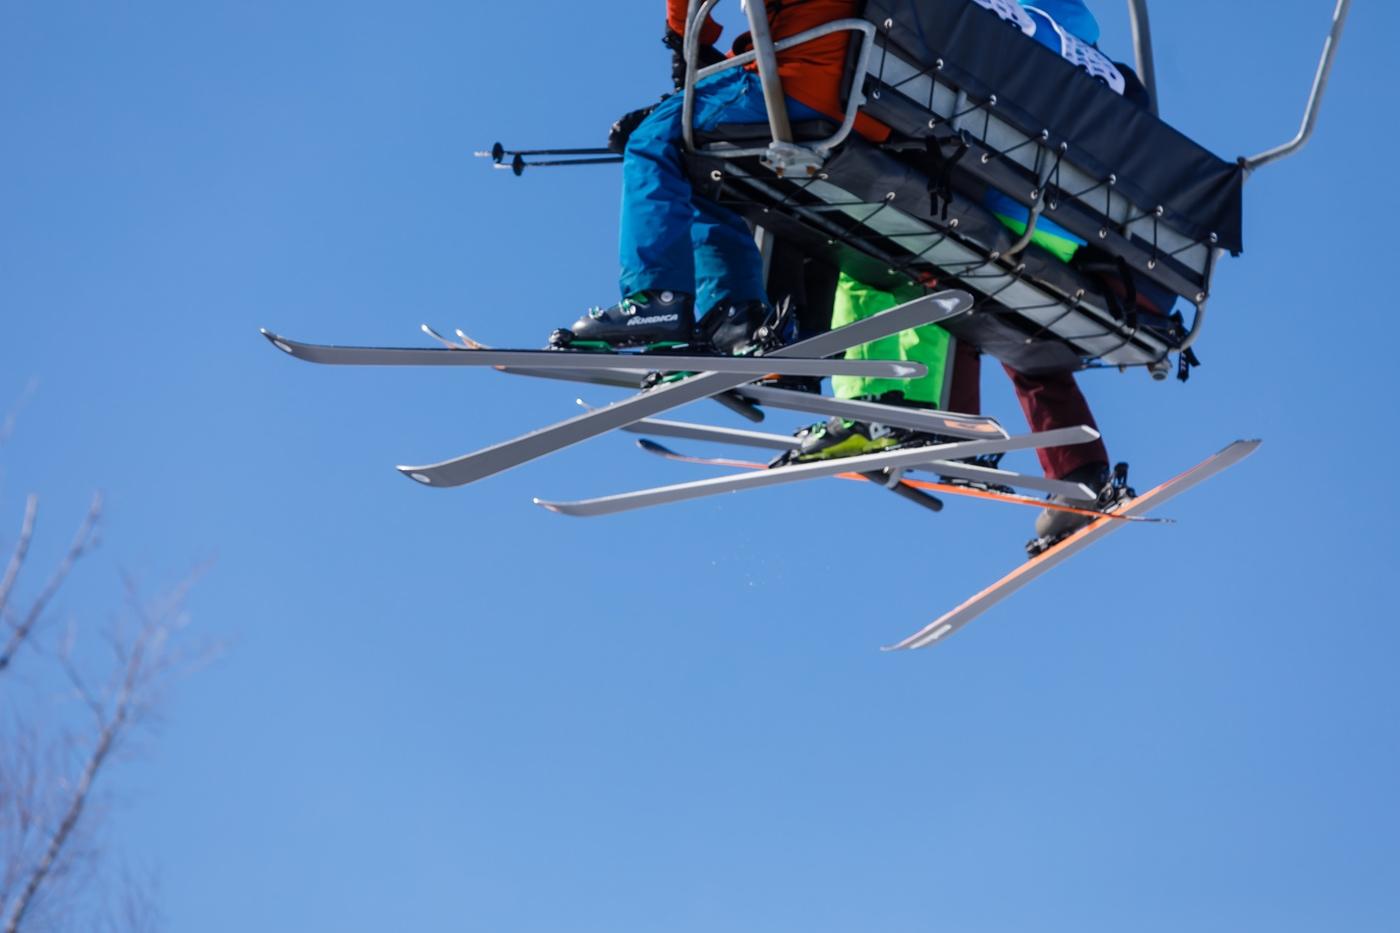 WinterKids Downhill 24 2021 SDP 3204